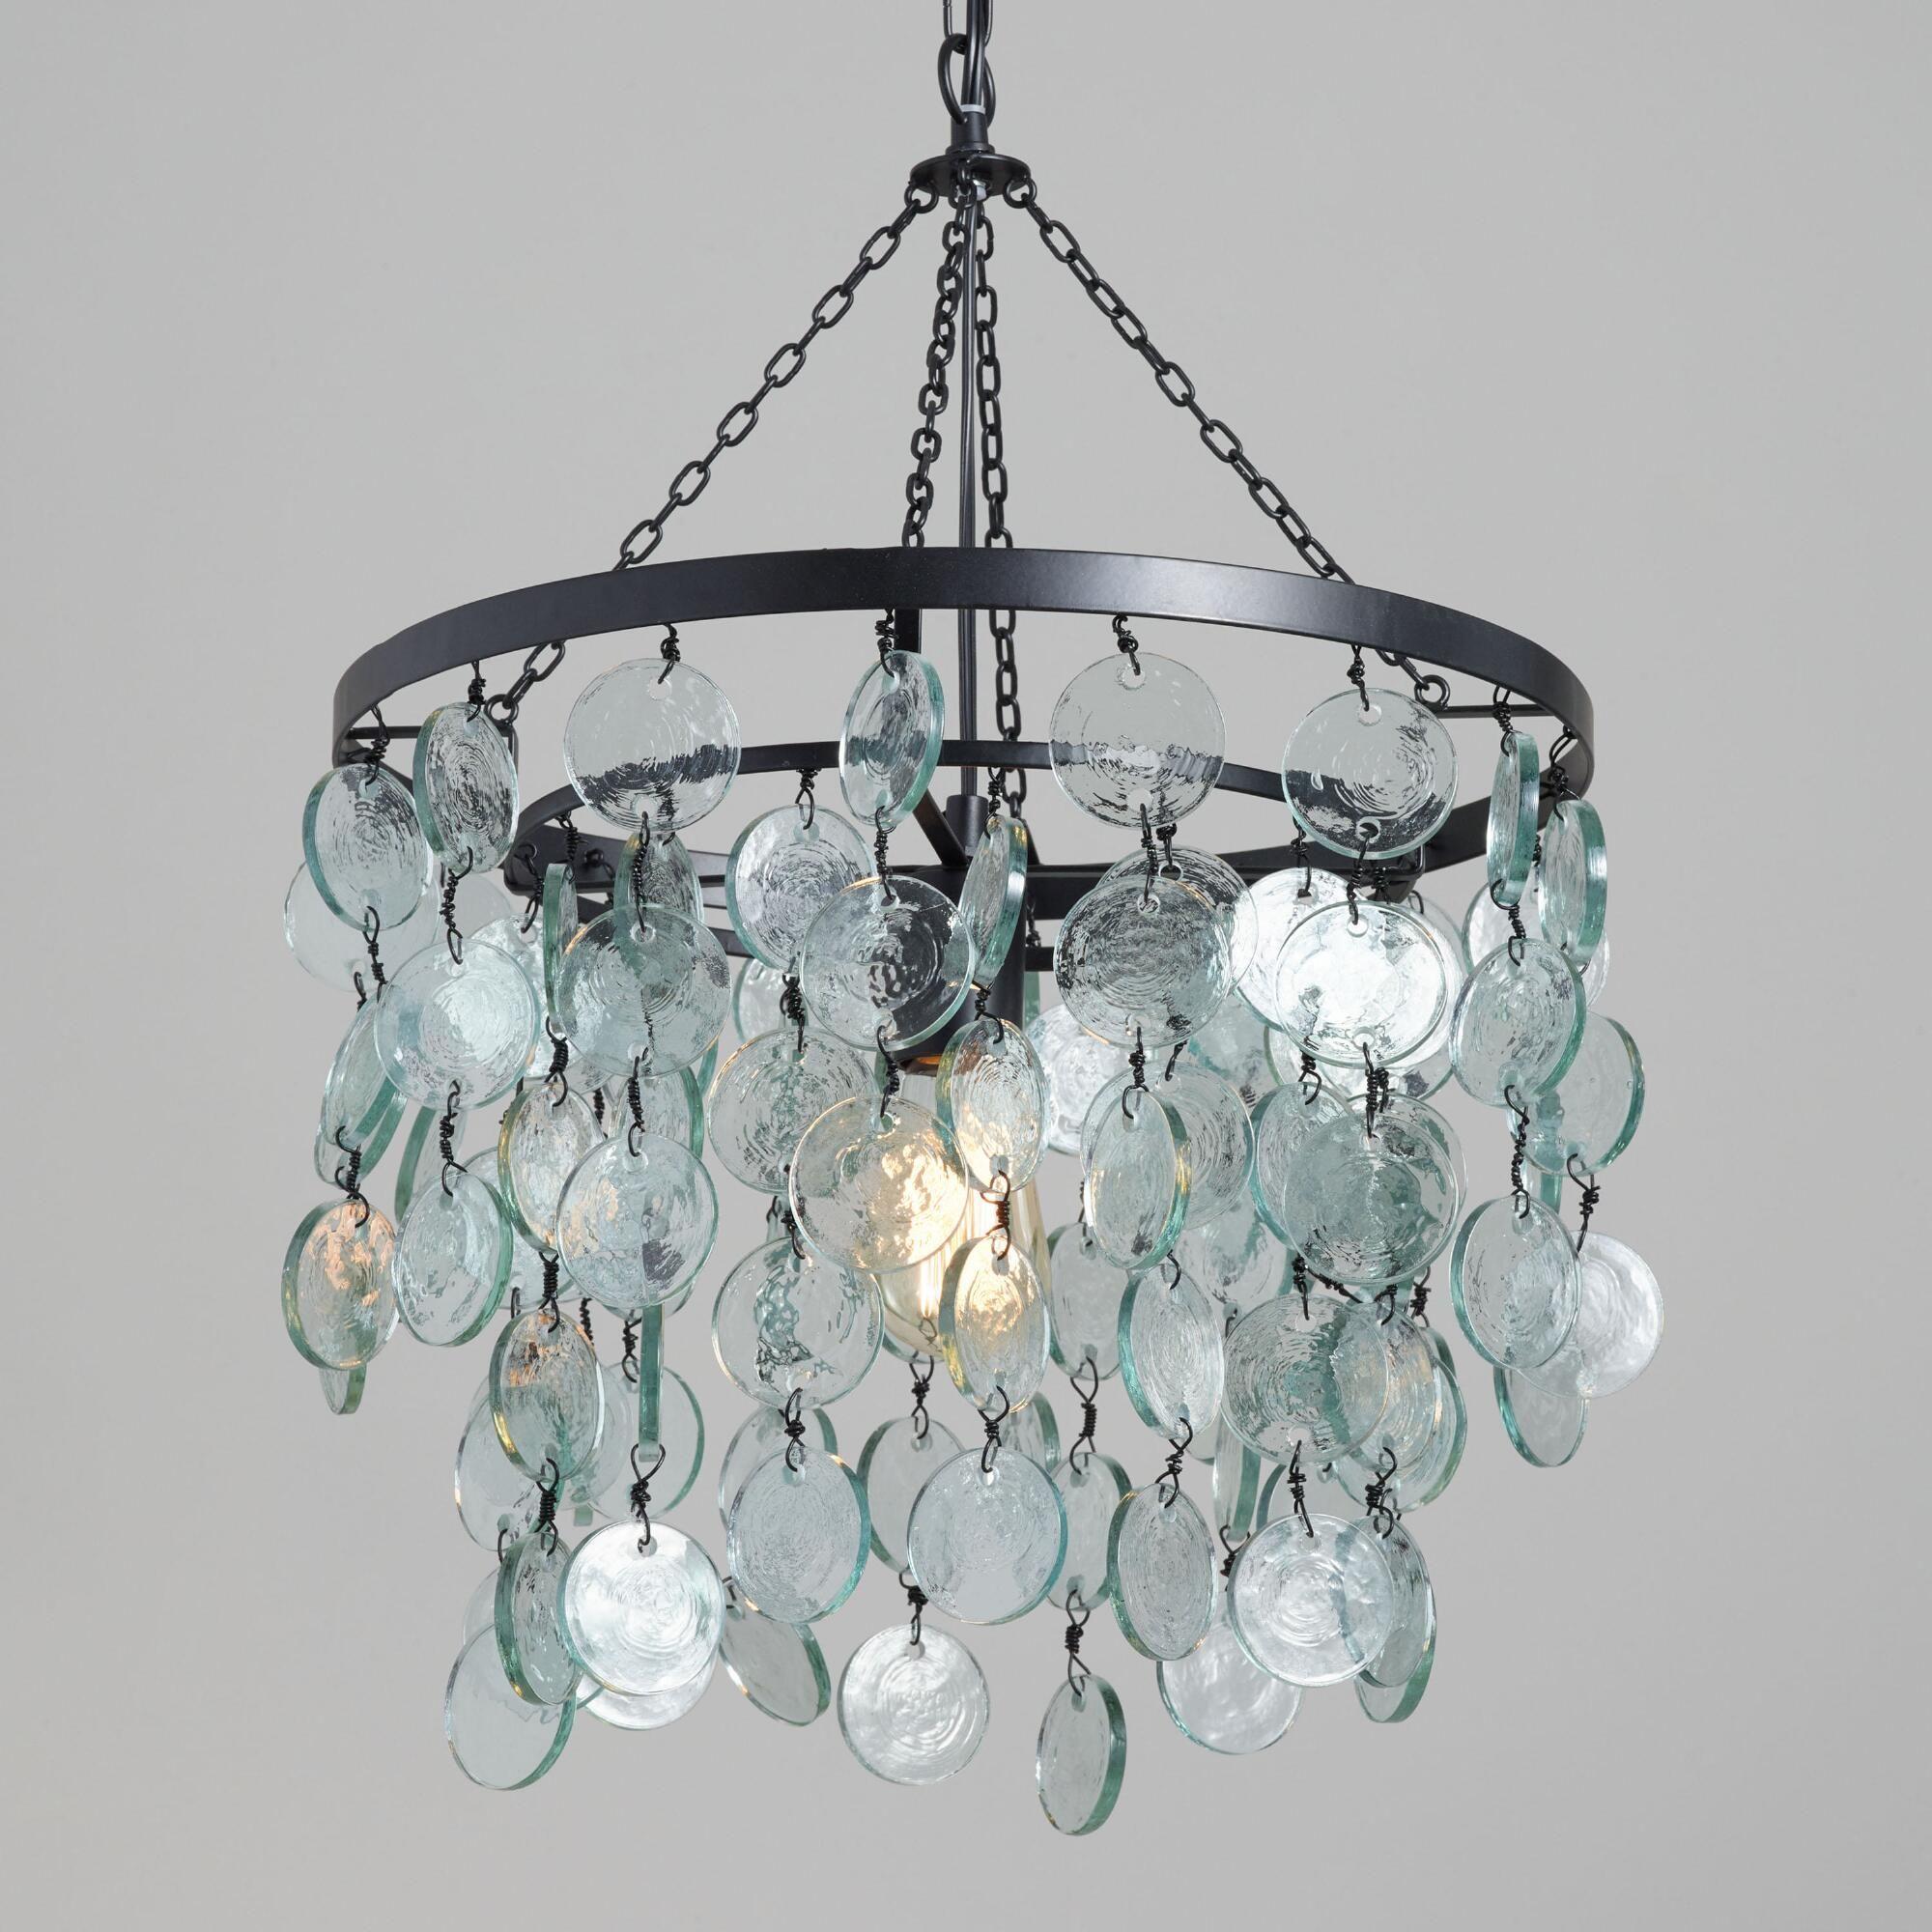 Aqua Draped Sea Glass Disc Pendant Lamp by World Market in ...